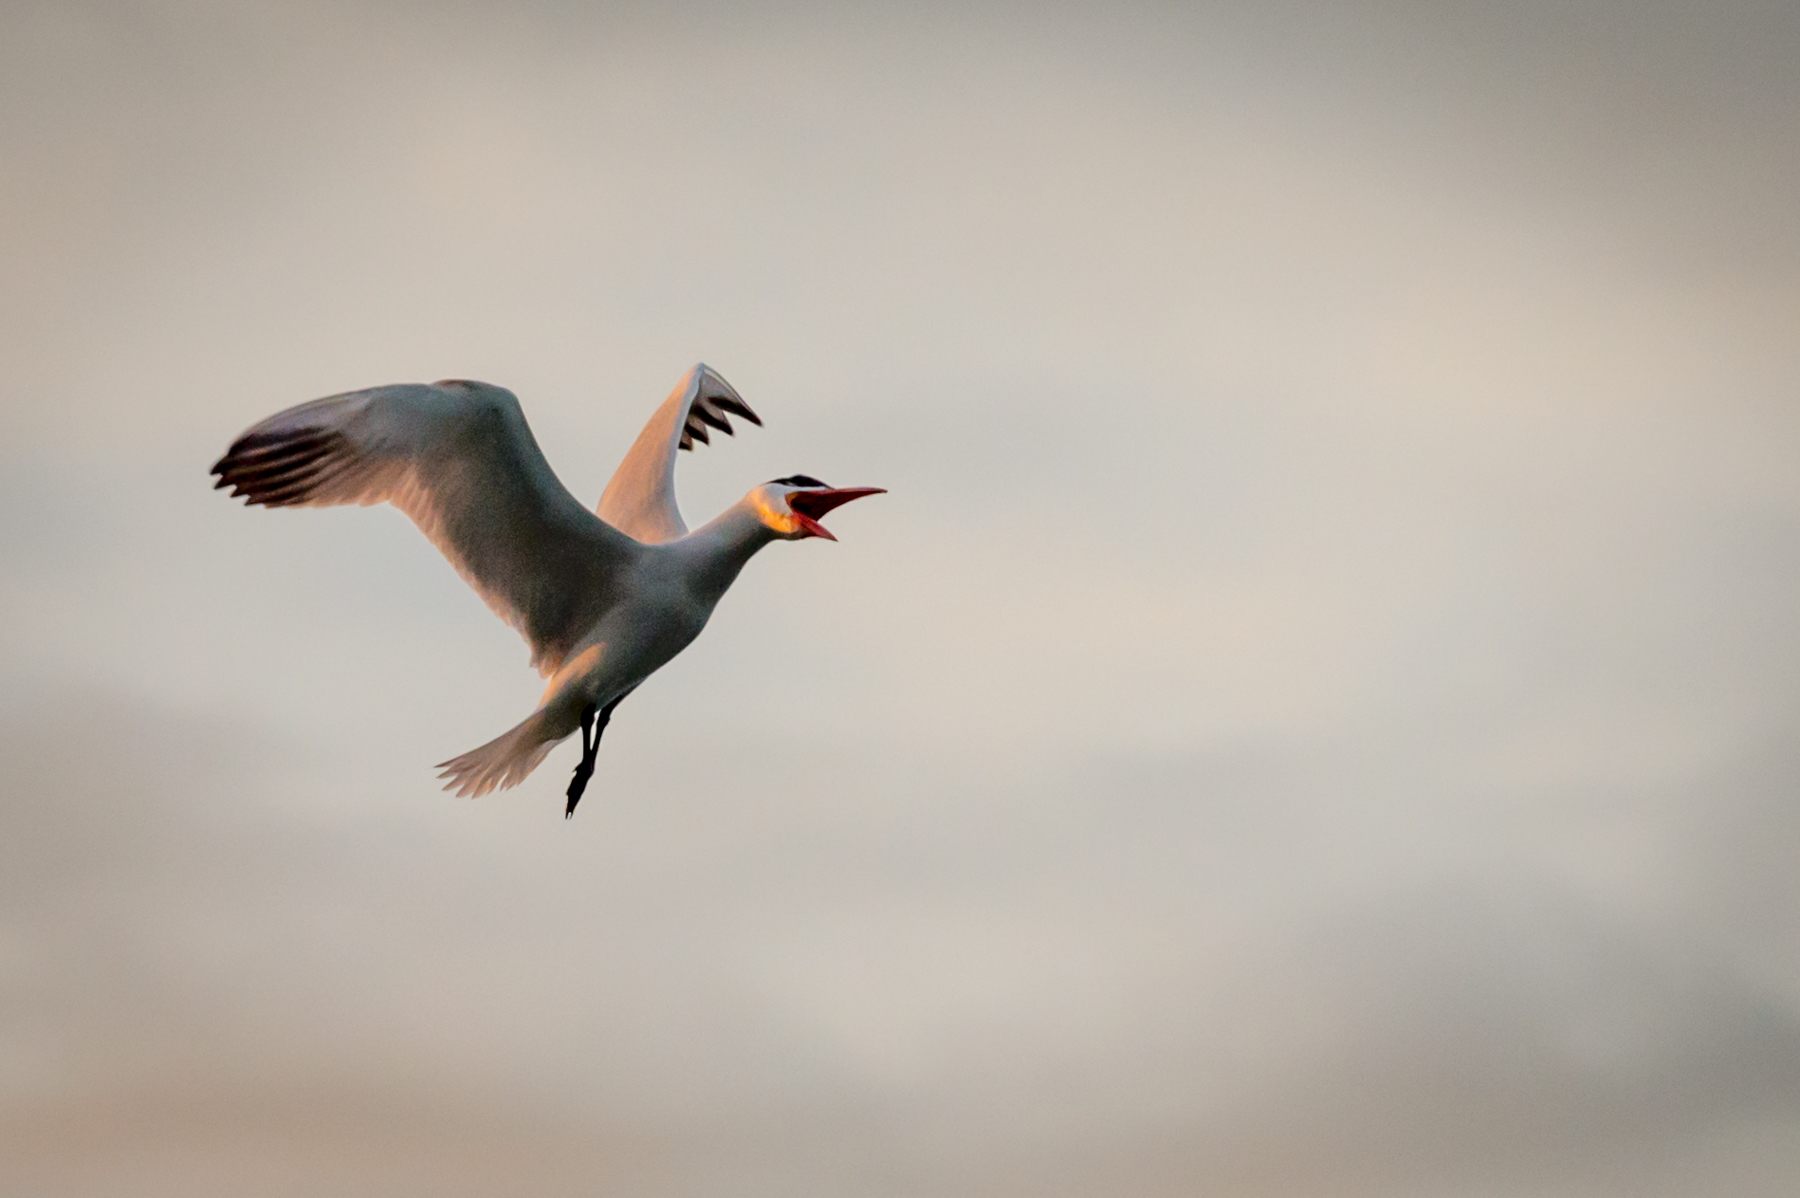 Ted_Glasoe_Wild-Life_Ticked-Tern_4.jpg